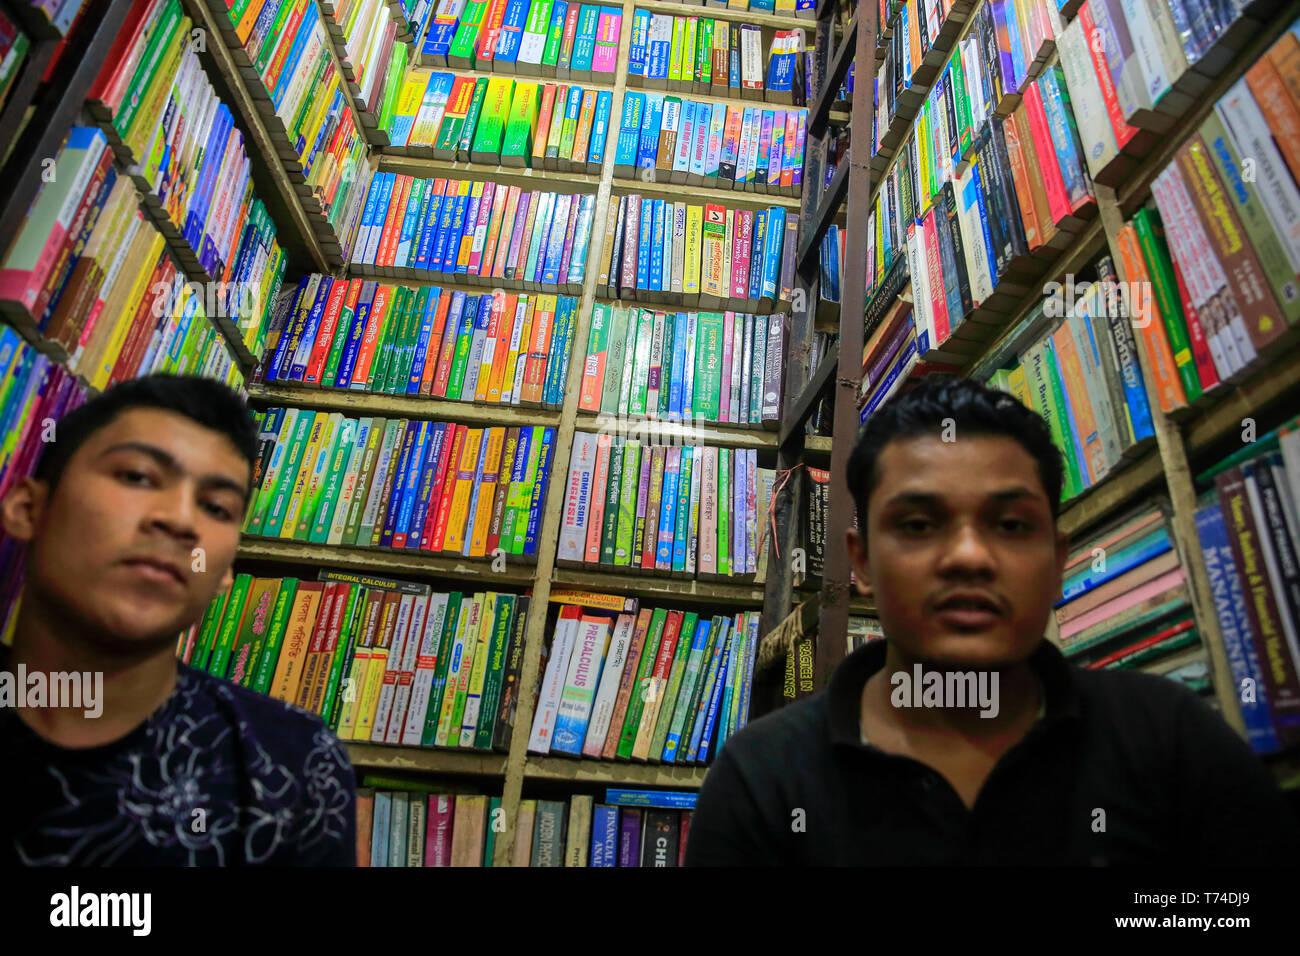 A bookshop at Nilkhet book market, Dhaka, Bangladesh. - Stock Image